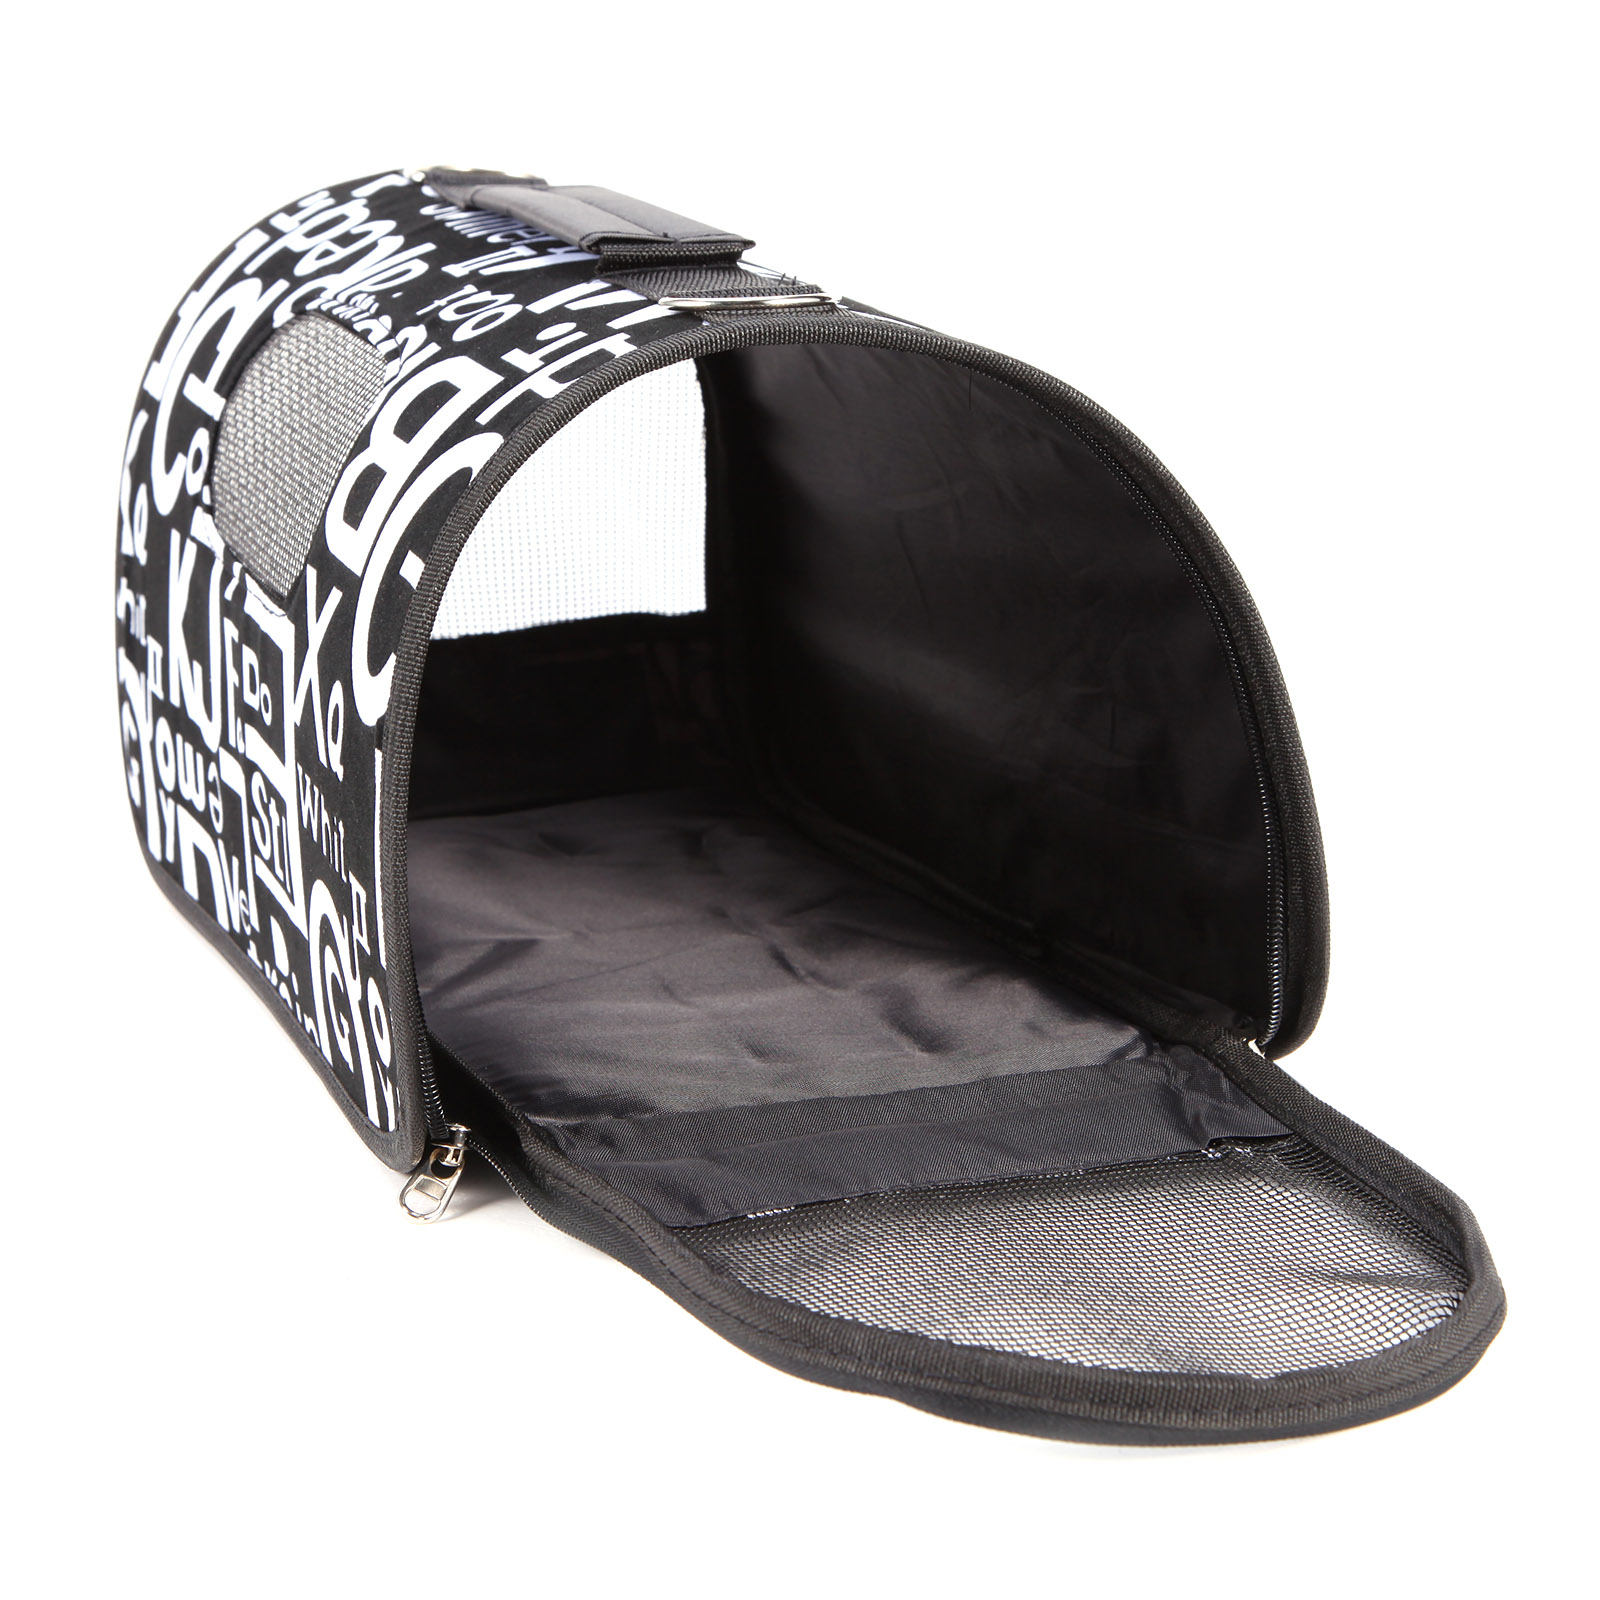 sac de transport sacoche panier voyage chien chat animaux. Black Bedroom Furniture Sets. Home Design Ideas